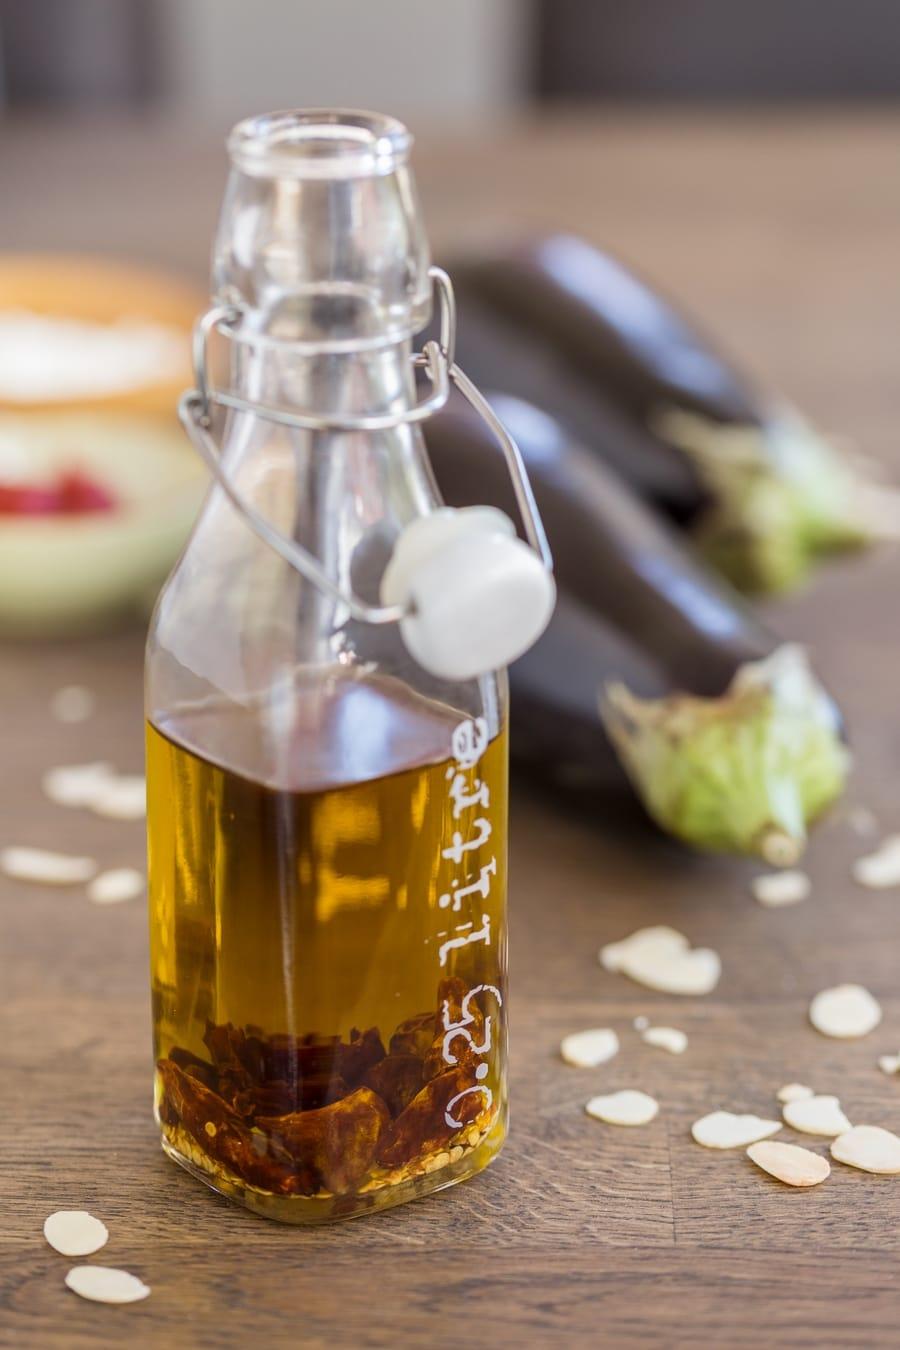 Italian chili oil in a glass bottle.